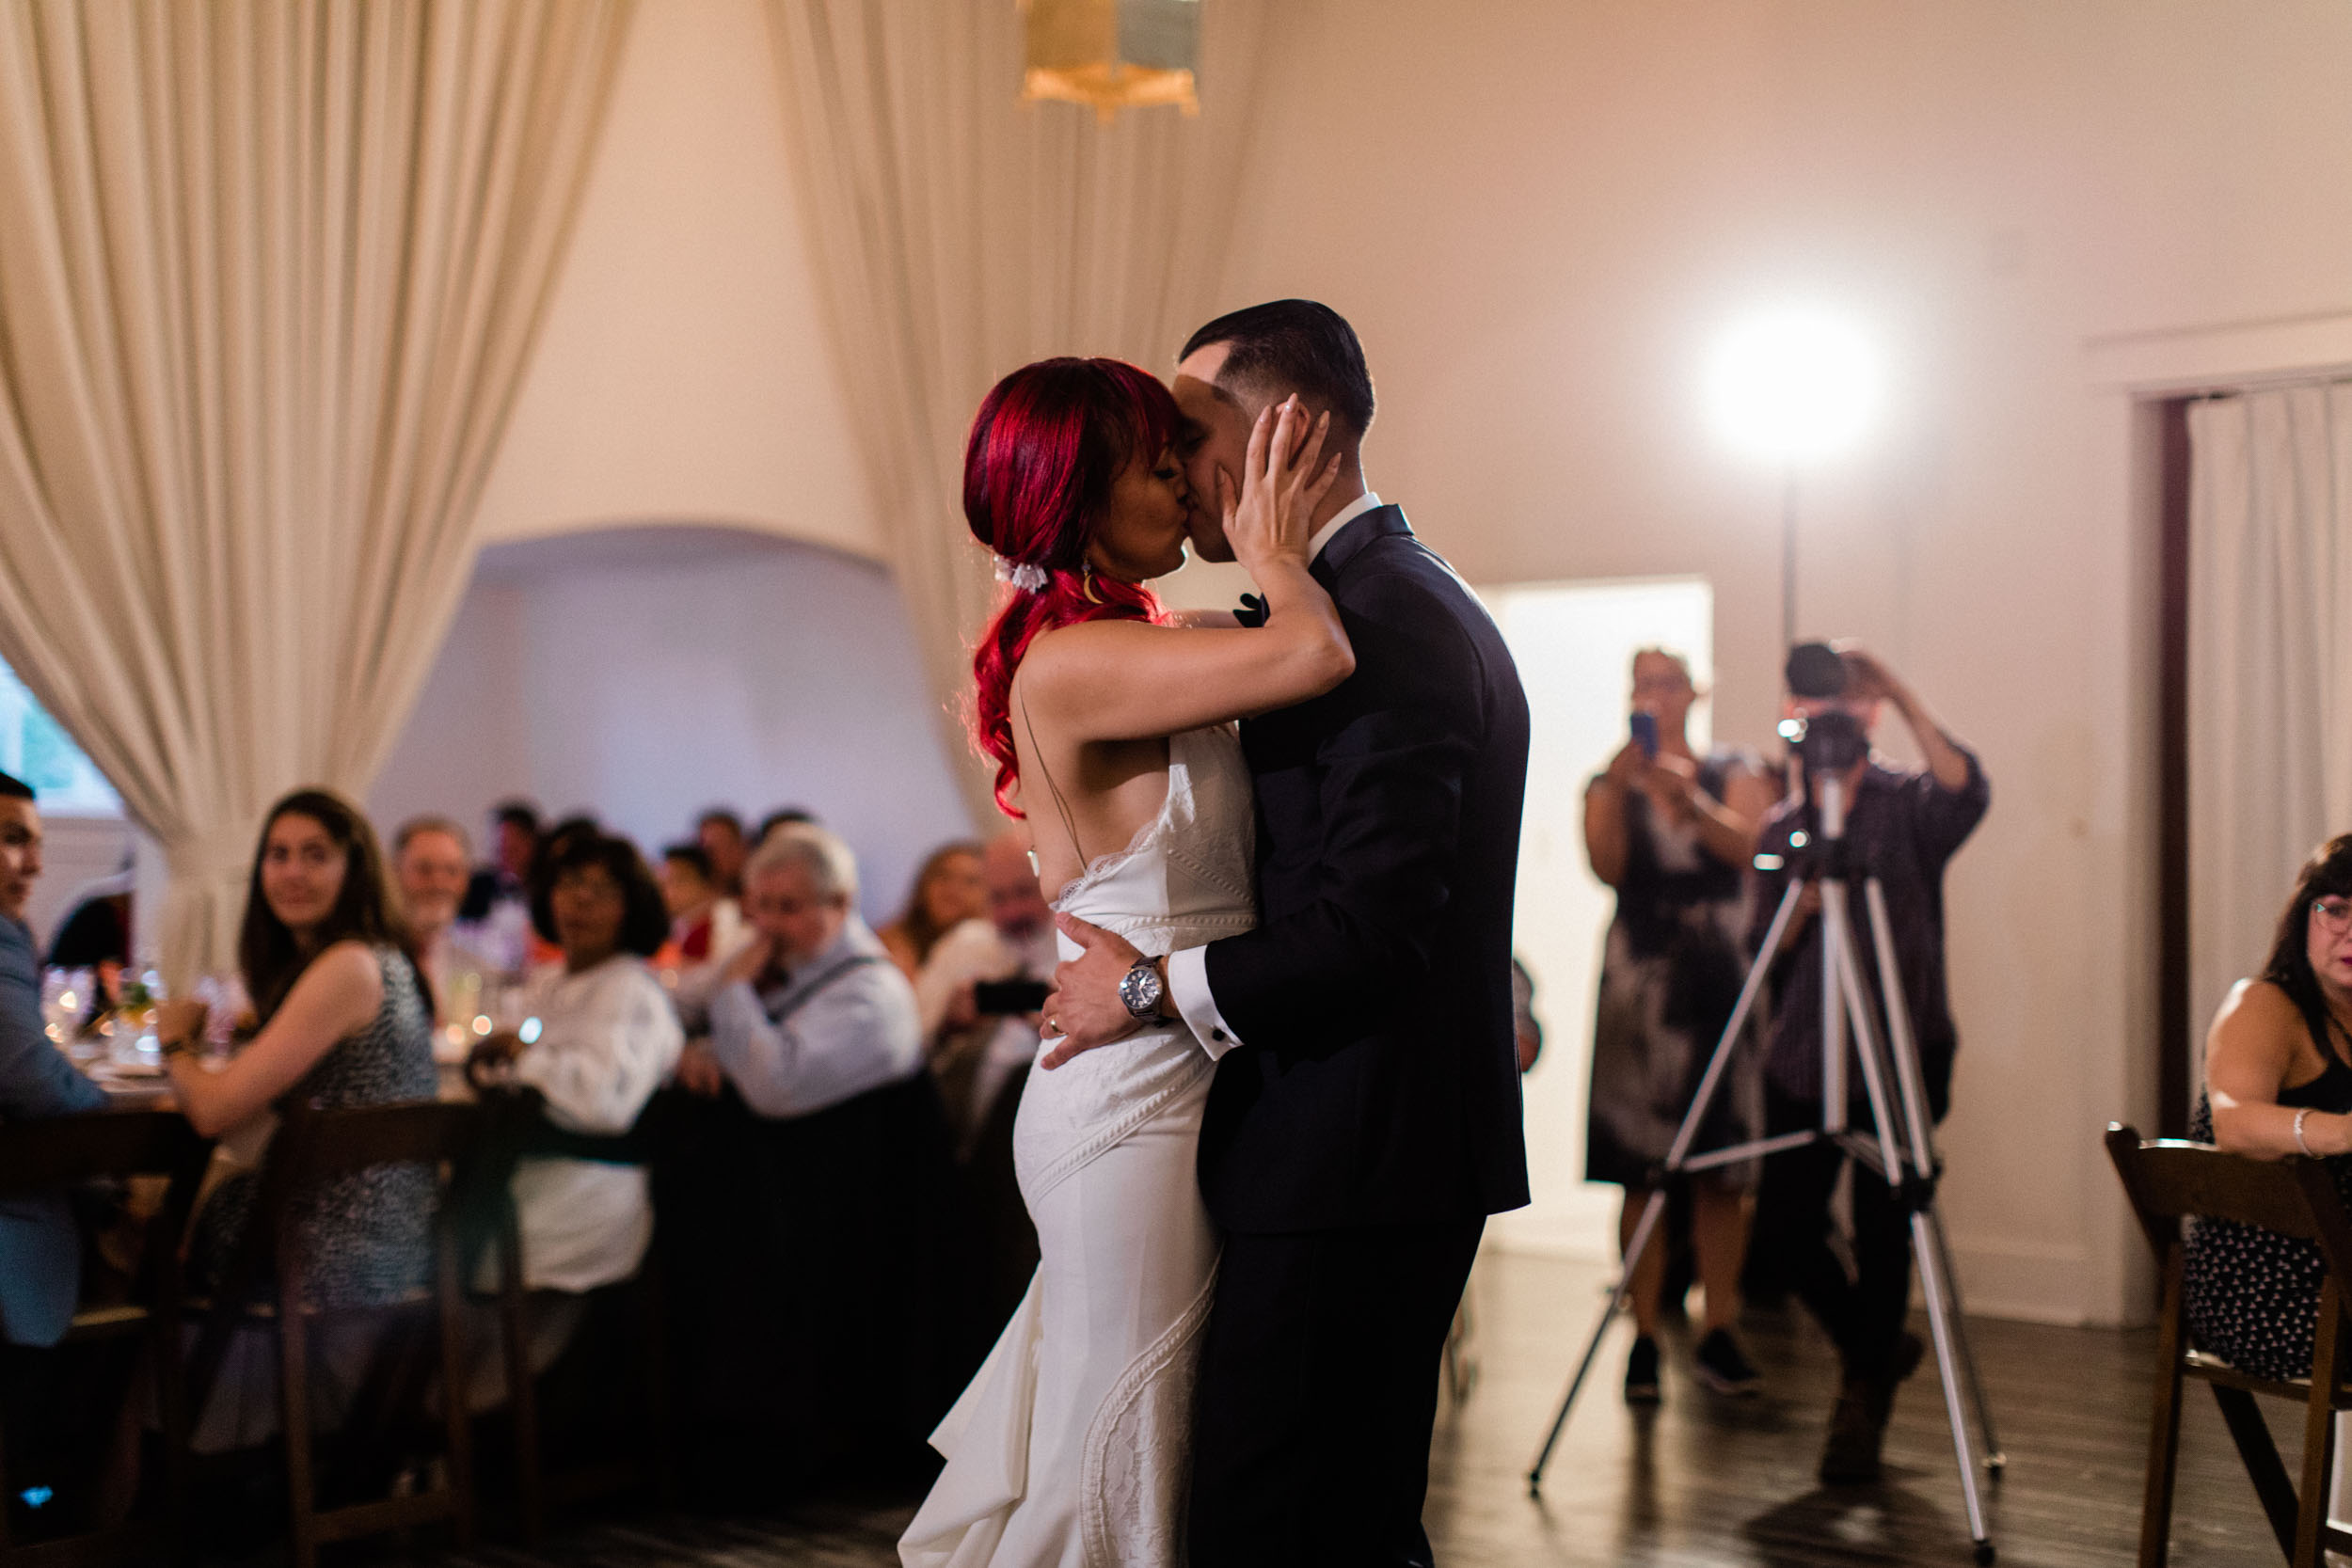 BKM-Photography-Los-Angeles-Highland-Park-York-Manor-Wedding-Photography-1135.jpg